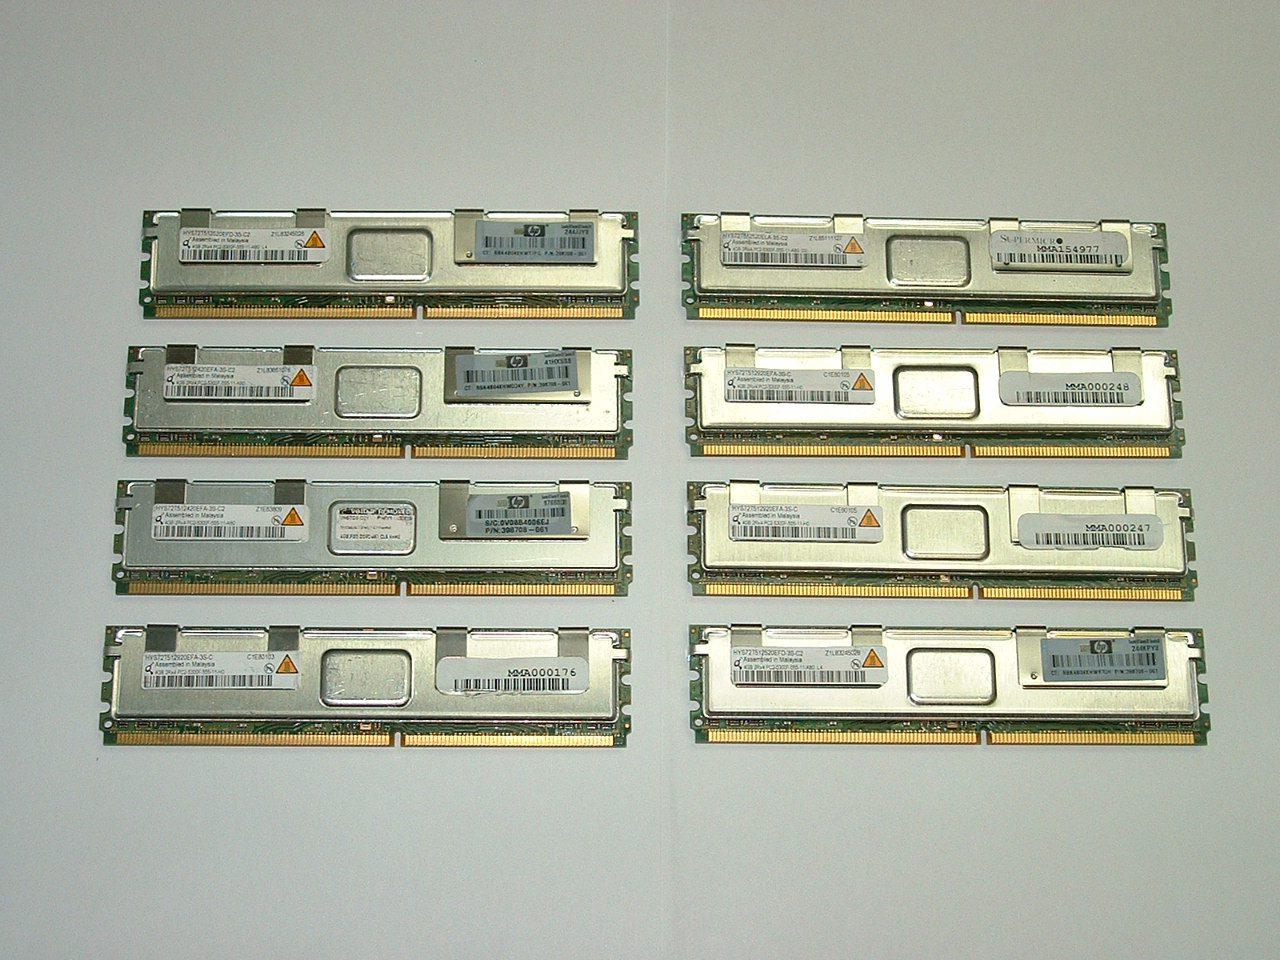 Poweredge 2900 memory slots / Agp slots function